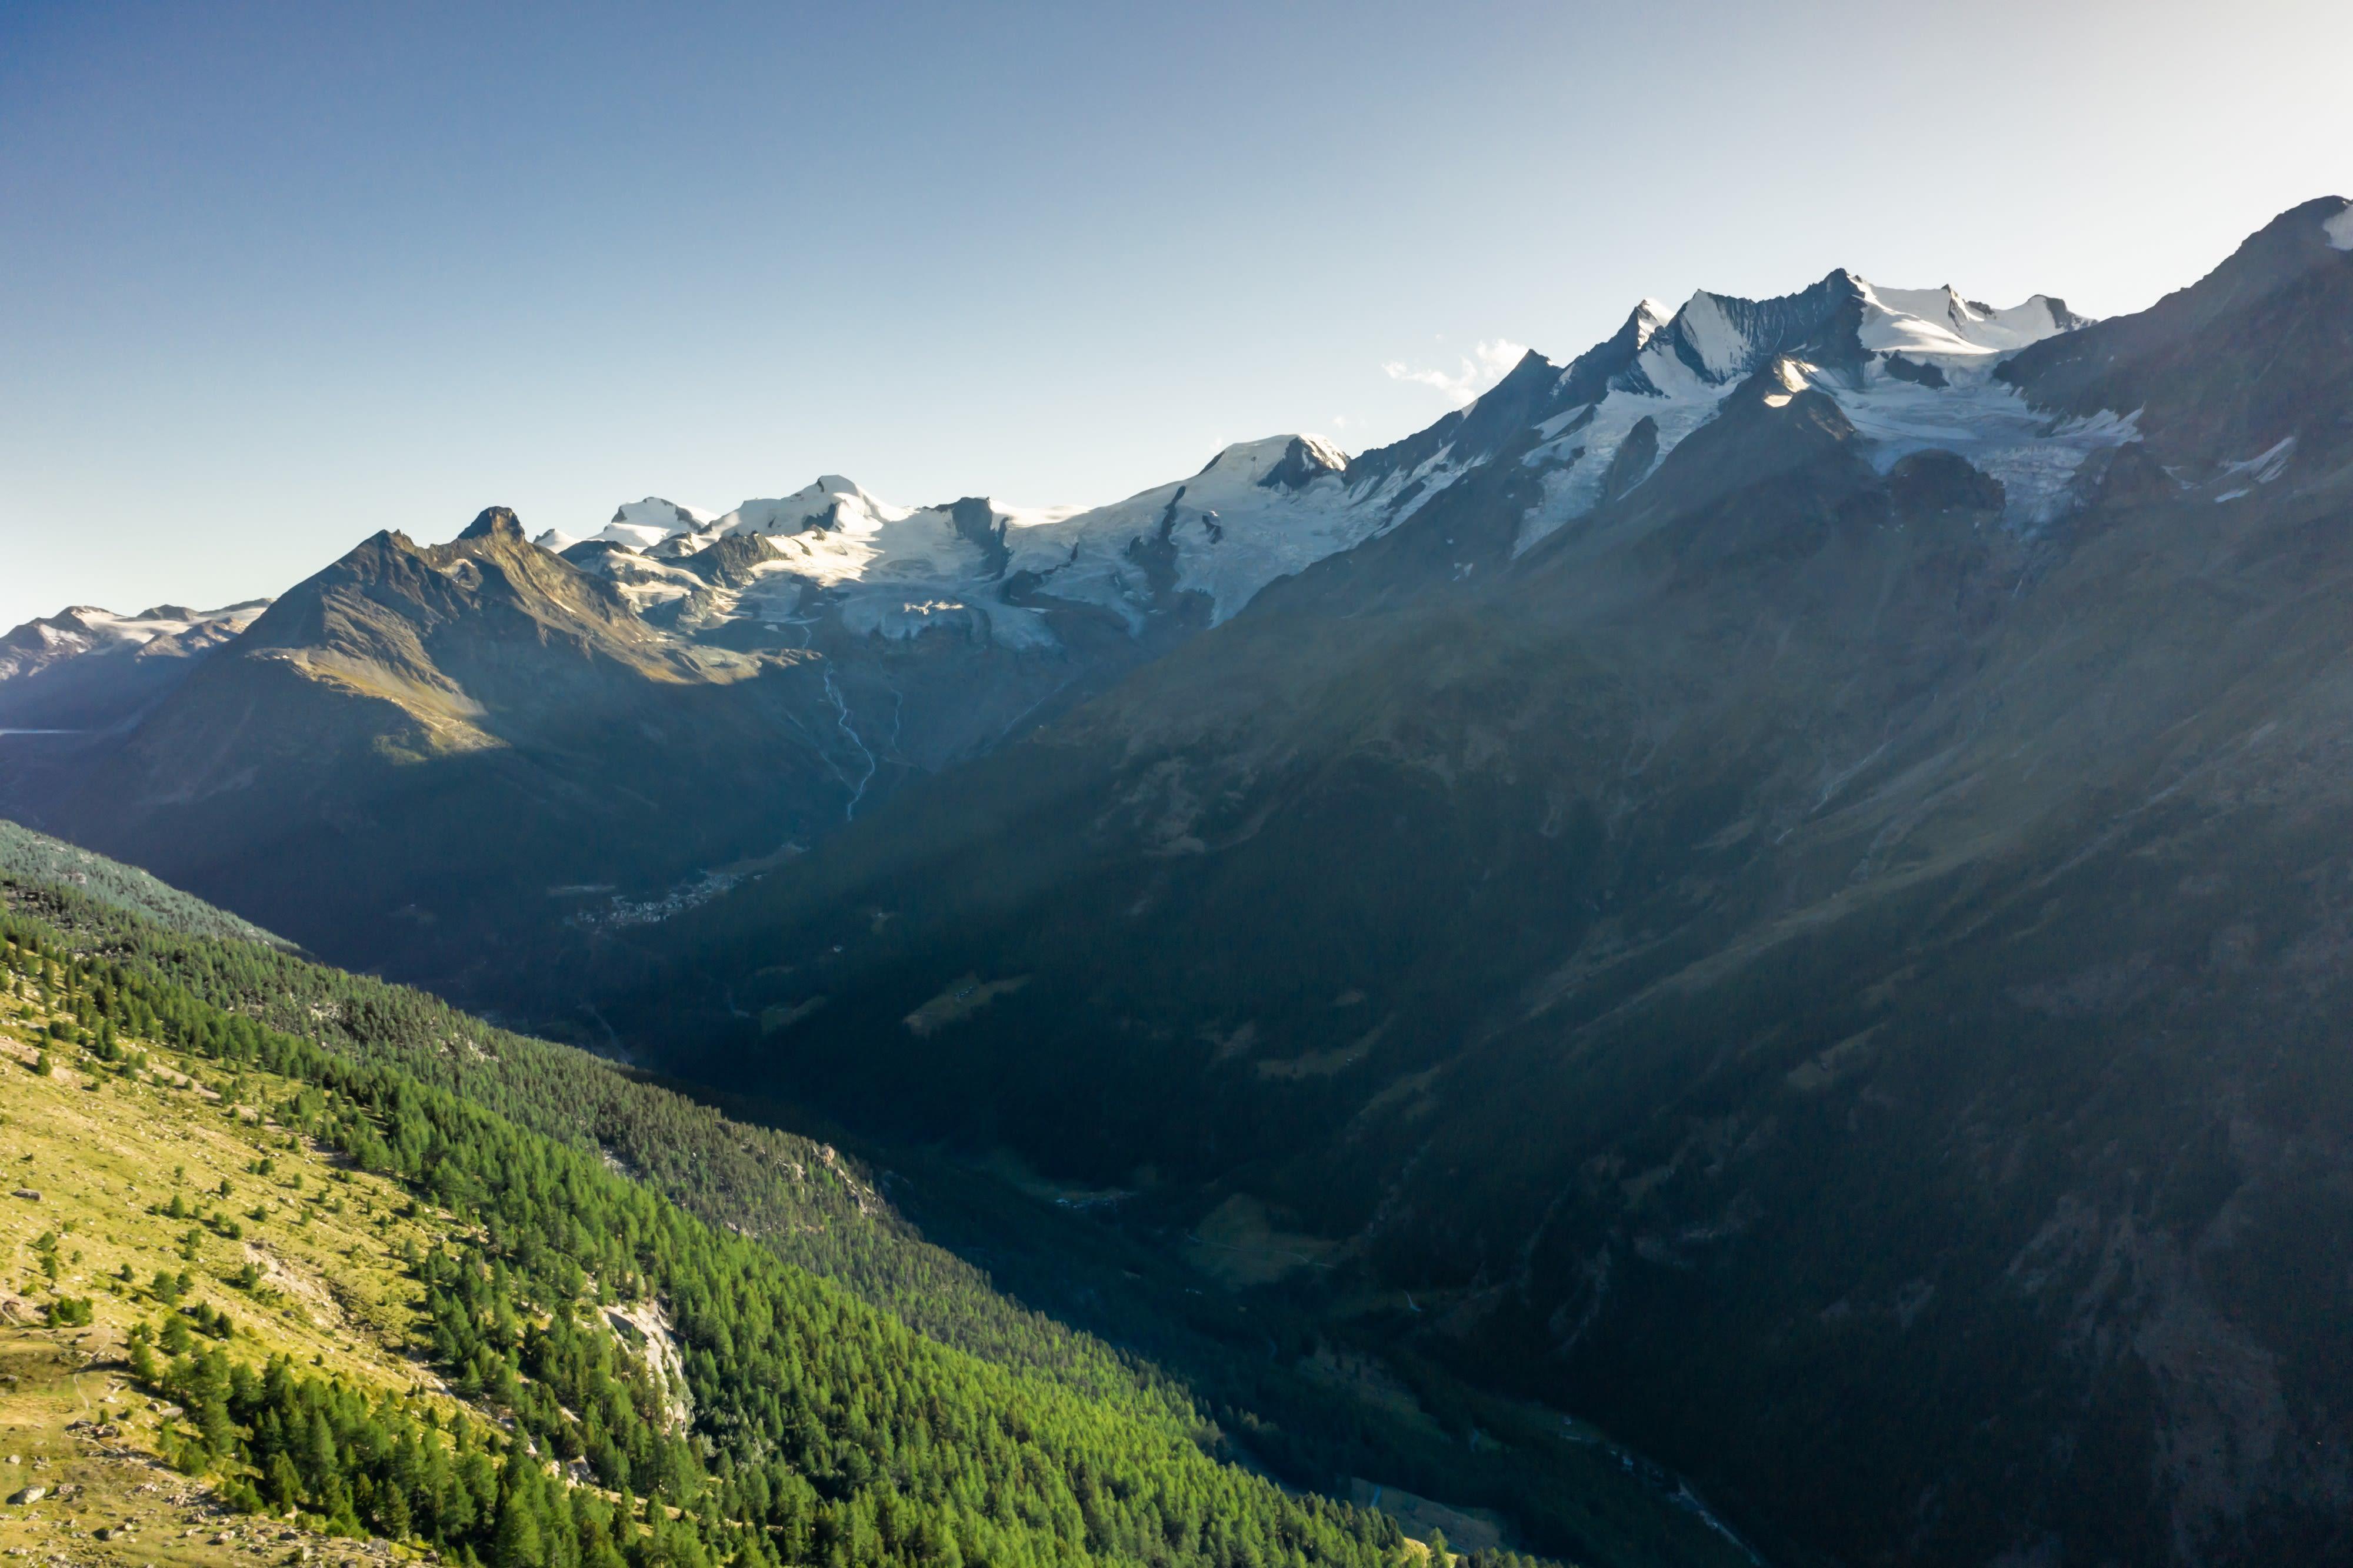 Experiences on the mountain